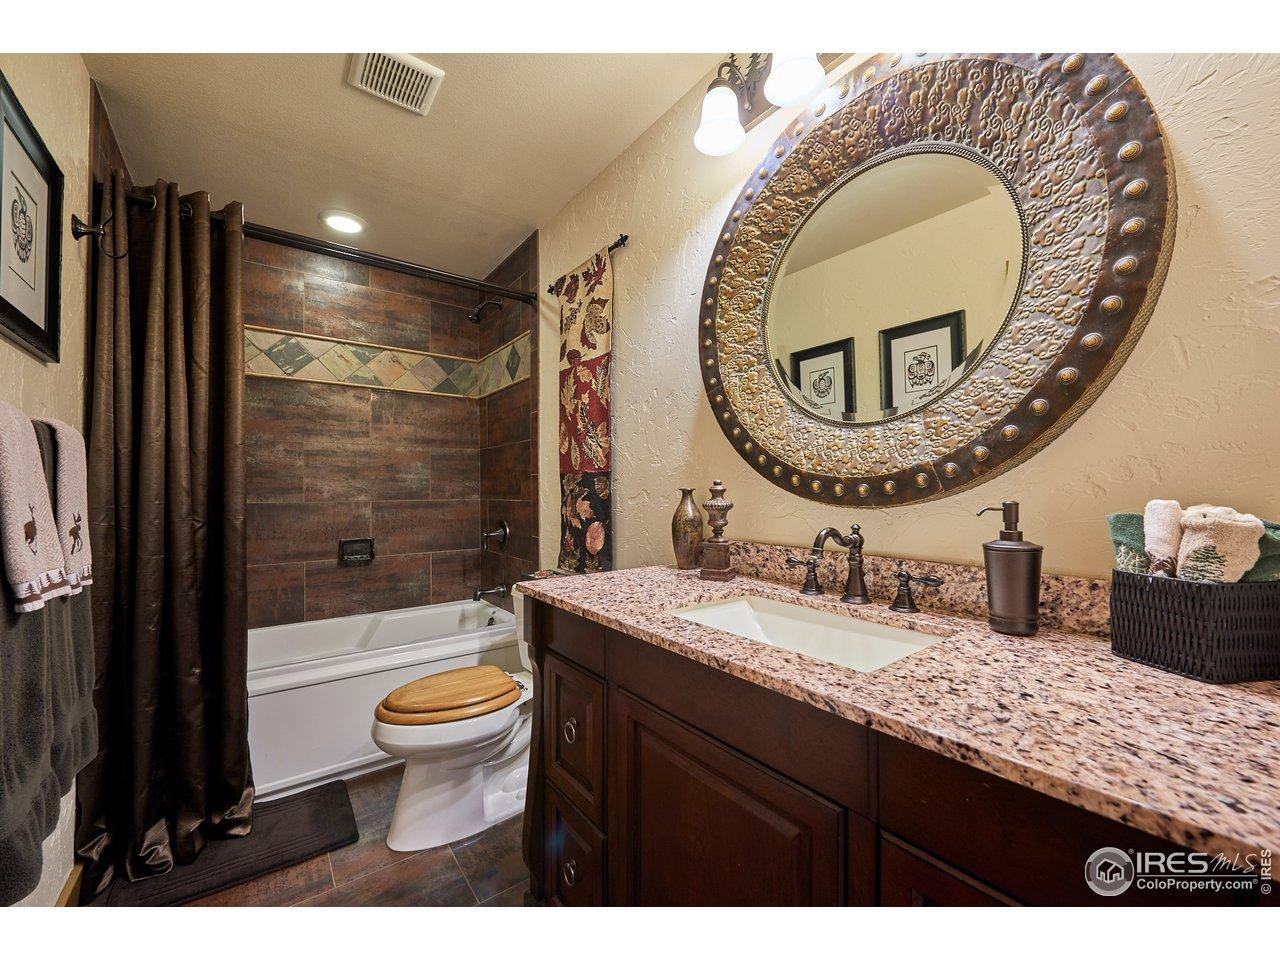 Guest bath with heated floor and granite vanity